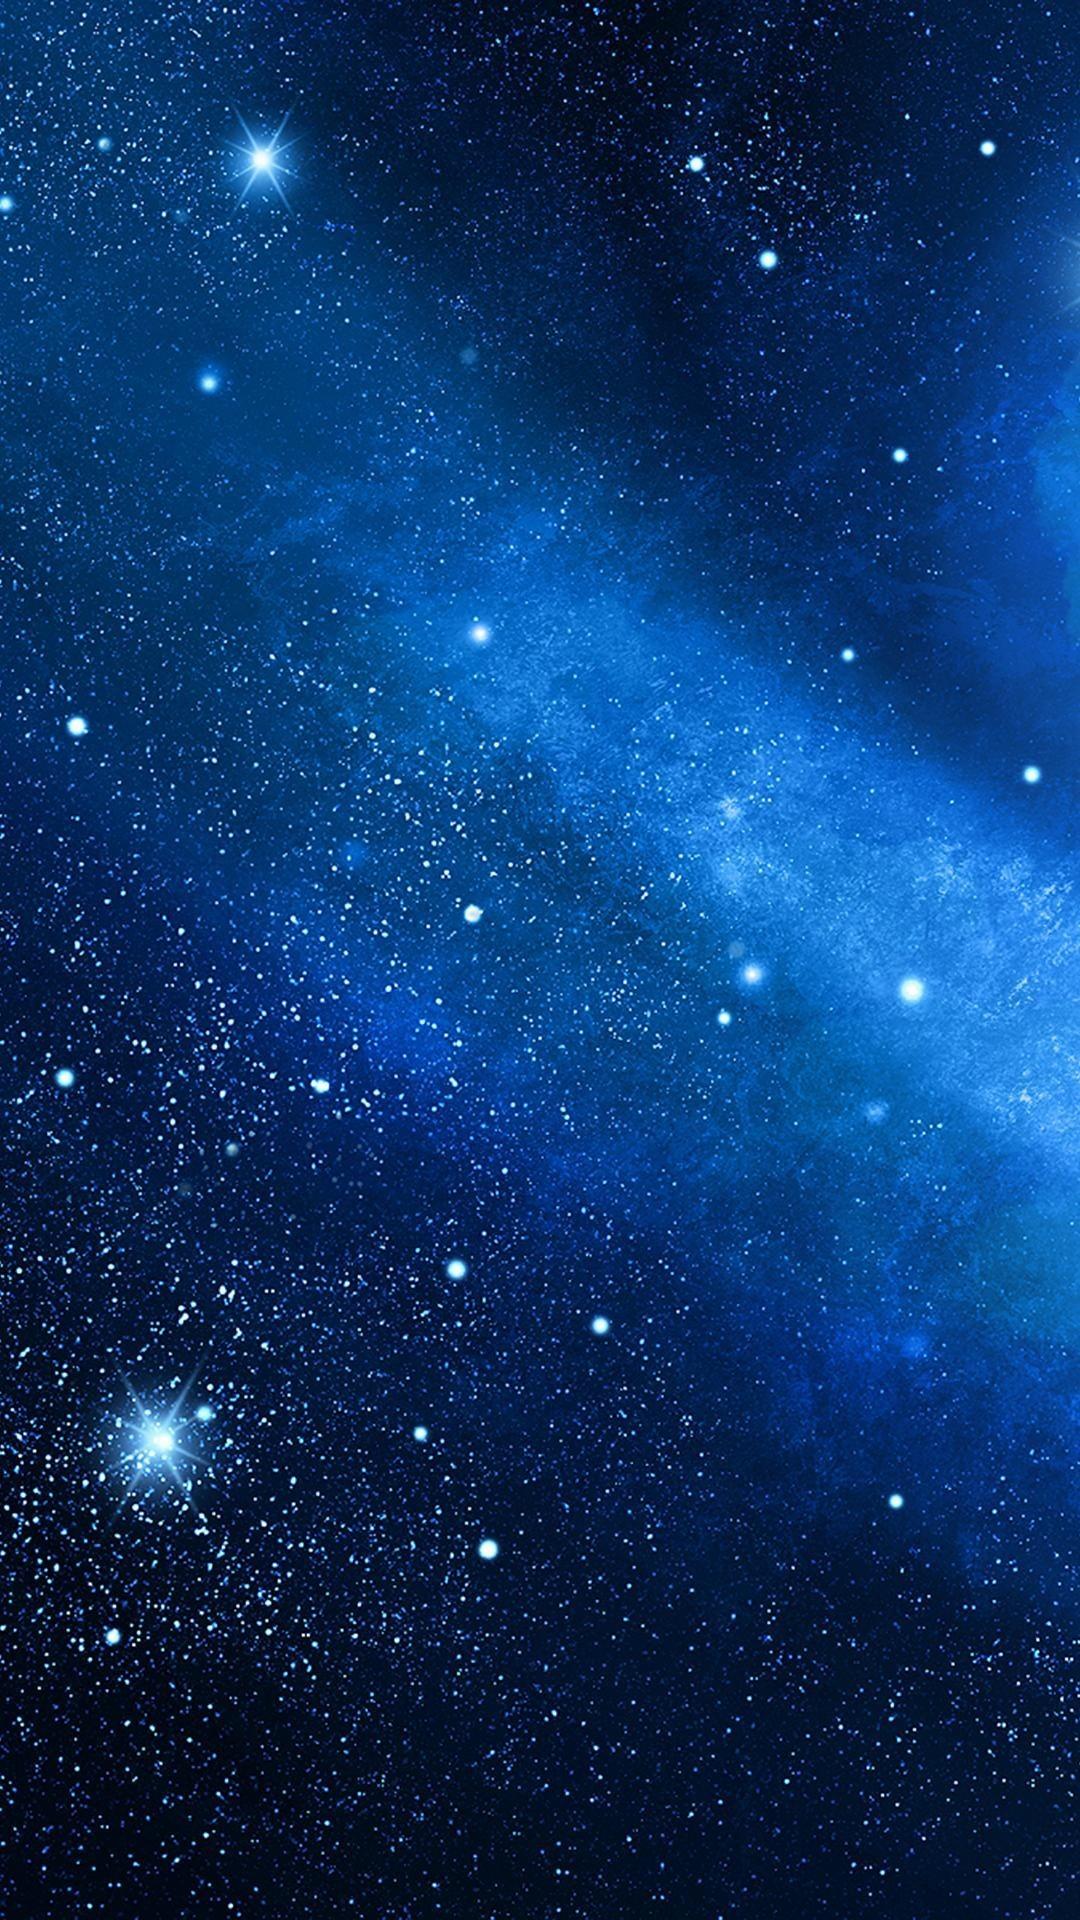 4k Galaxy Wallpaper 62 Images